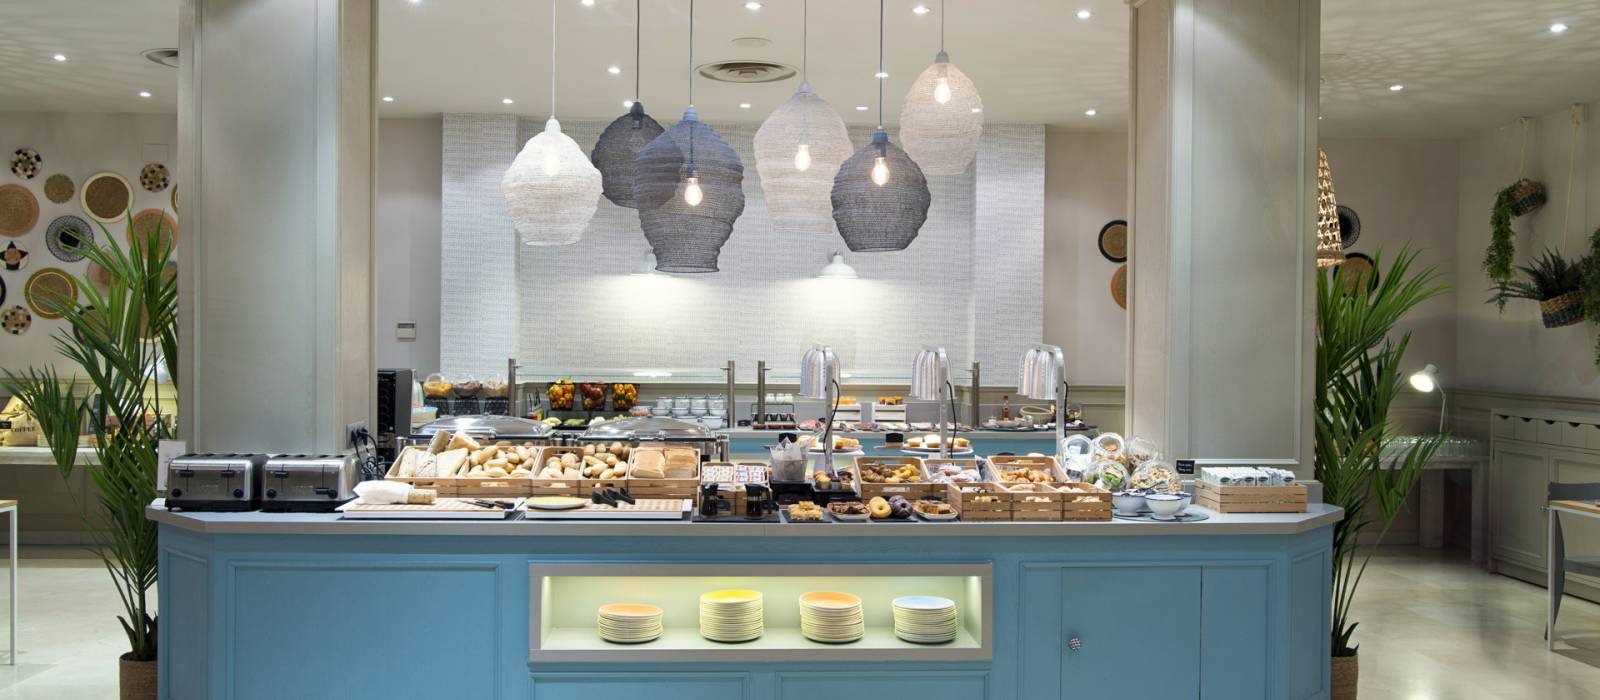 Desayuno Buffet Vincci Lys - Vincci Hoteles